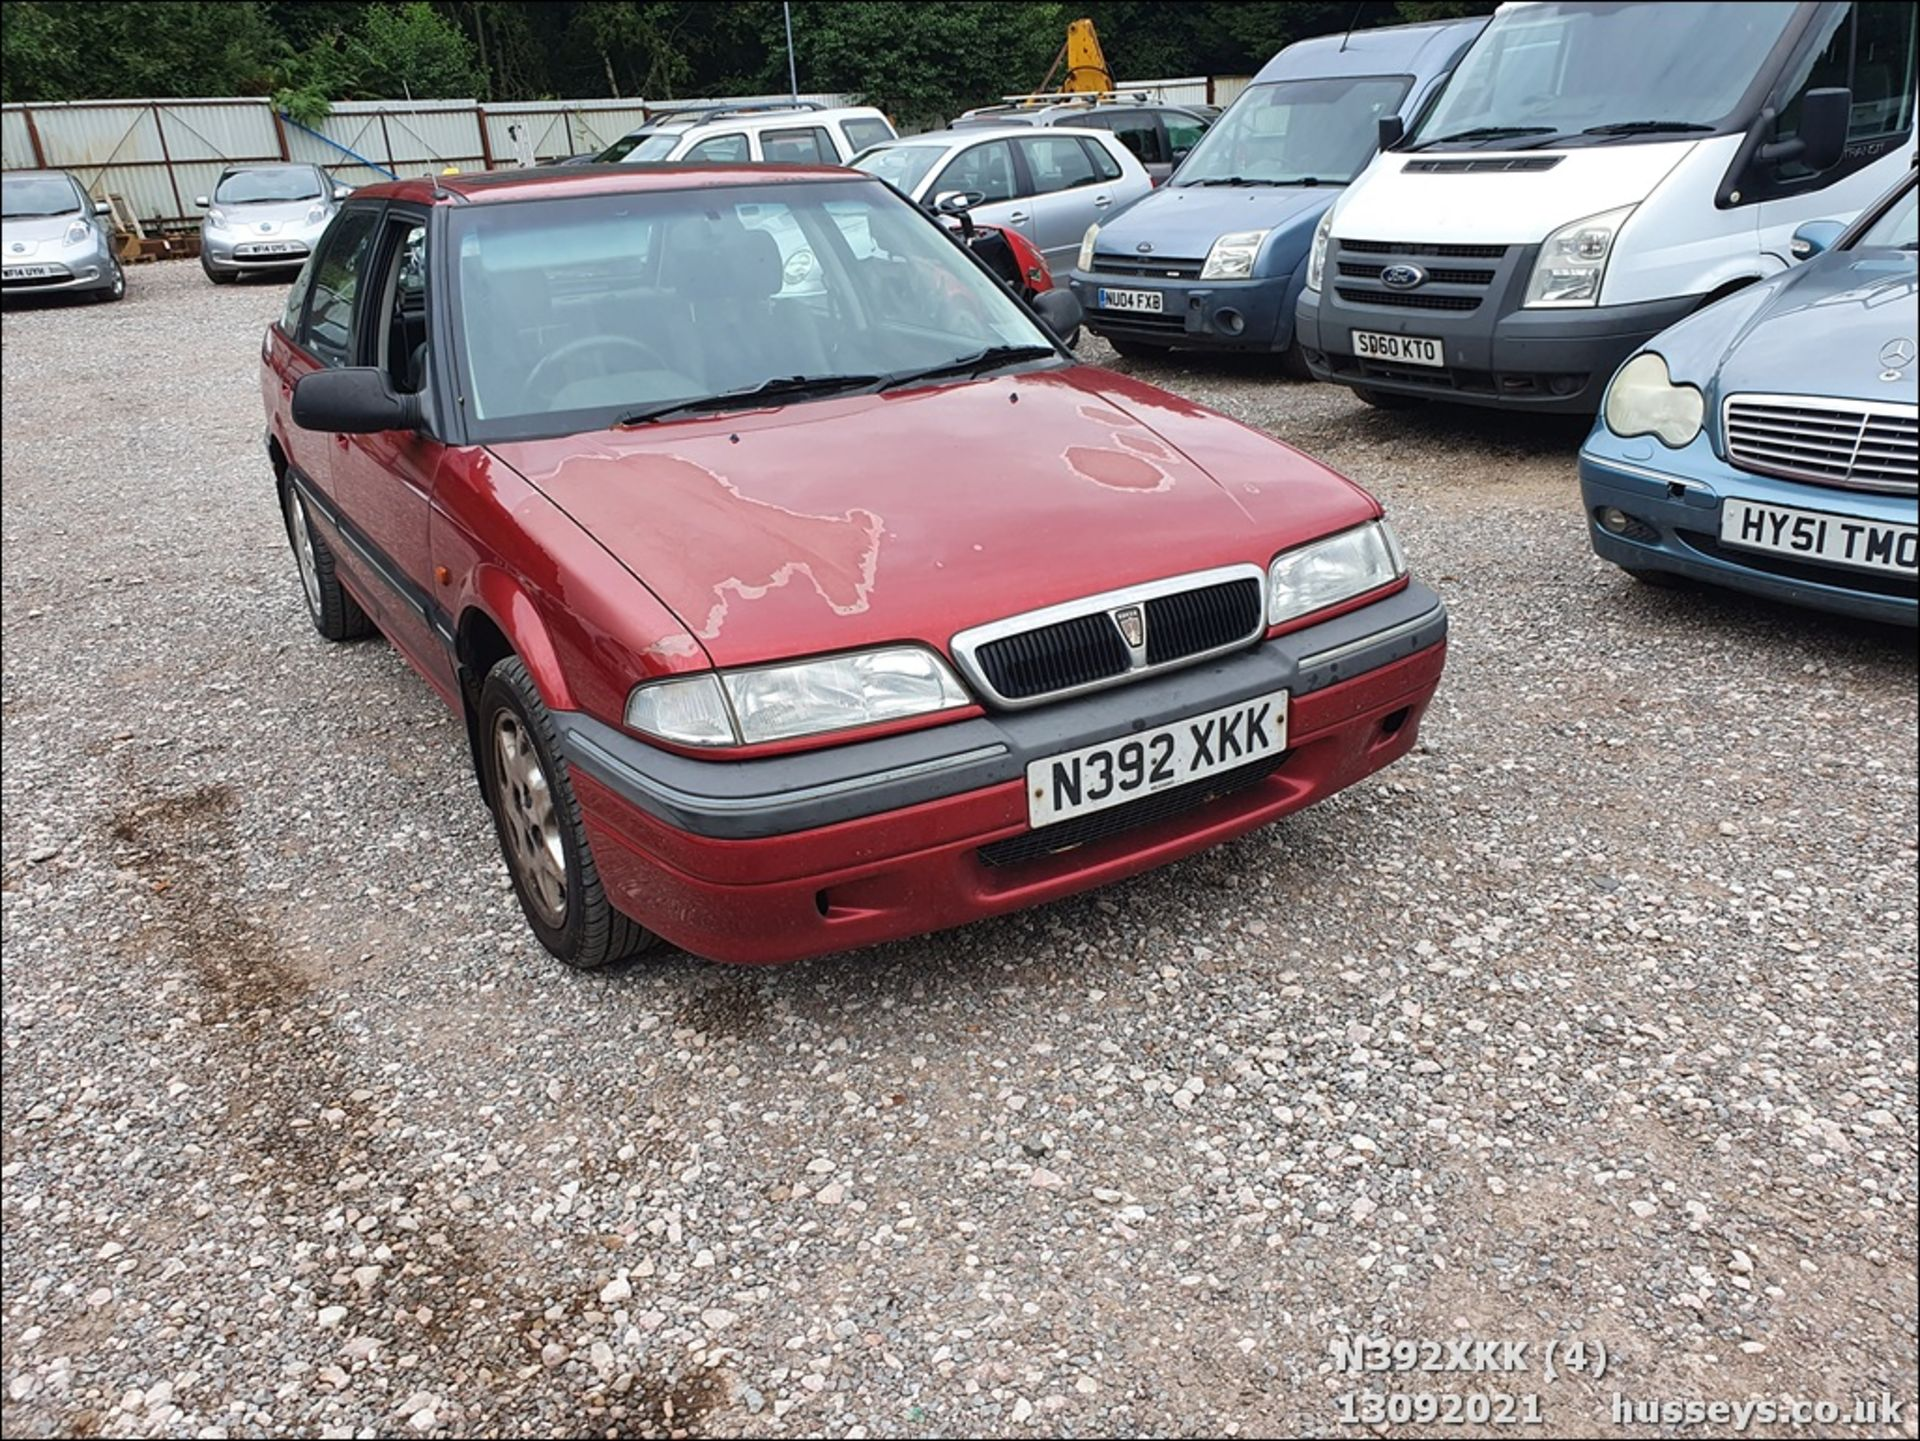 1995 ROVER 214 SEI - 1396cc 5dr Hatchback (Red, 99k) - Image 4 of 15